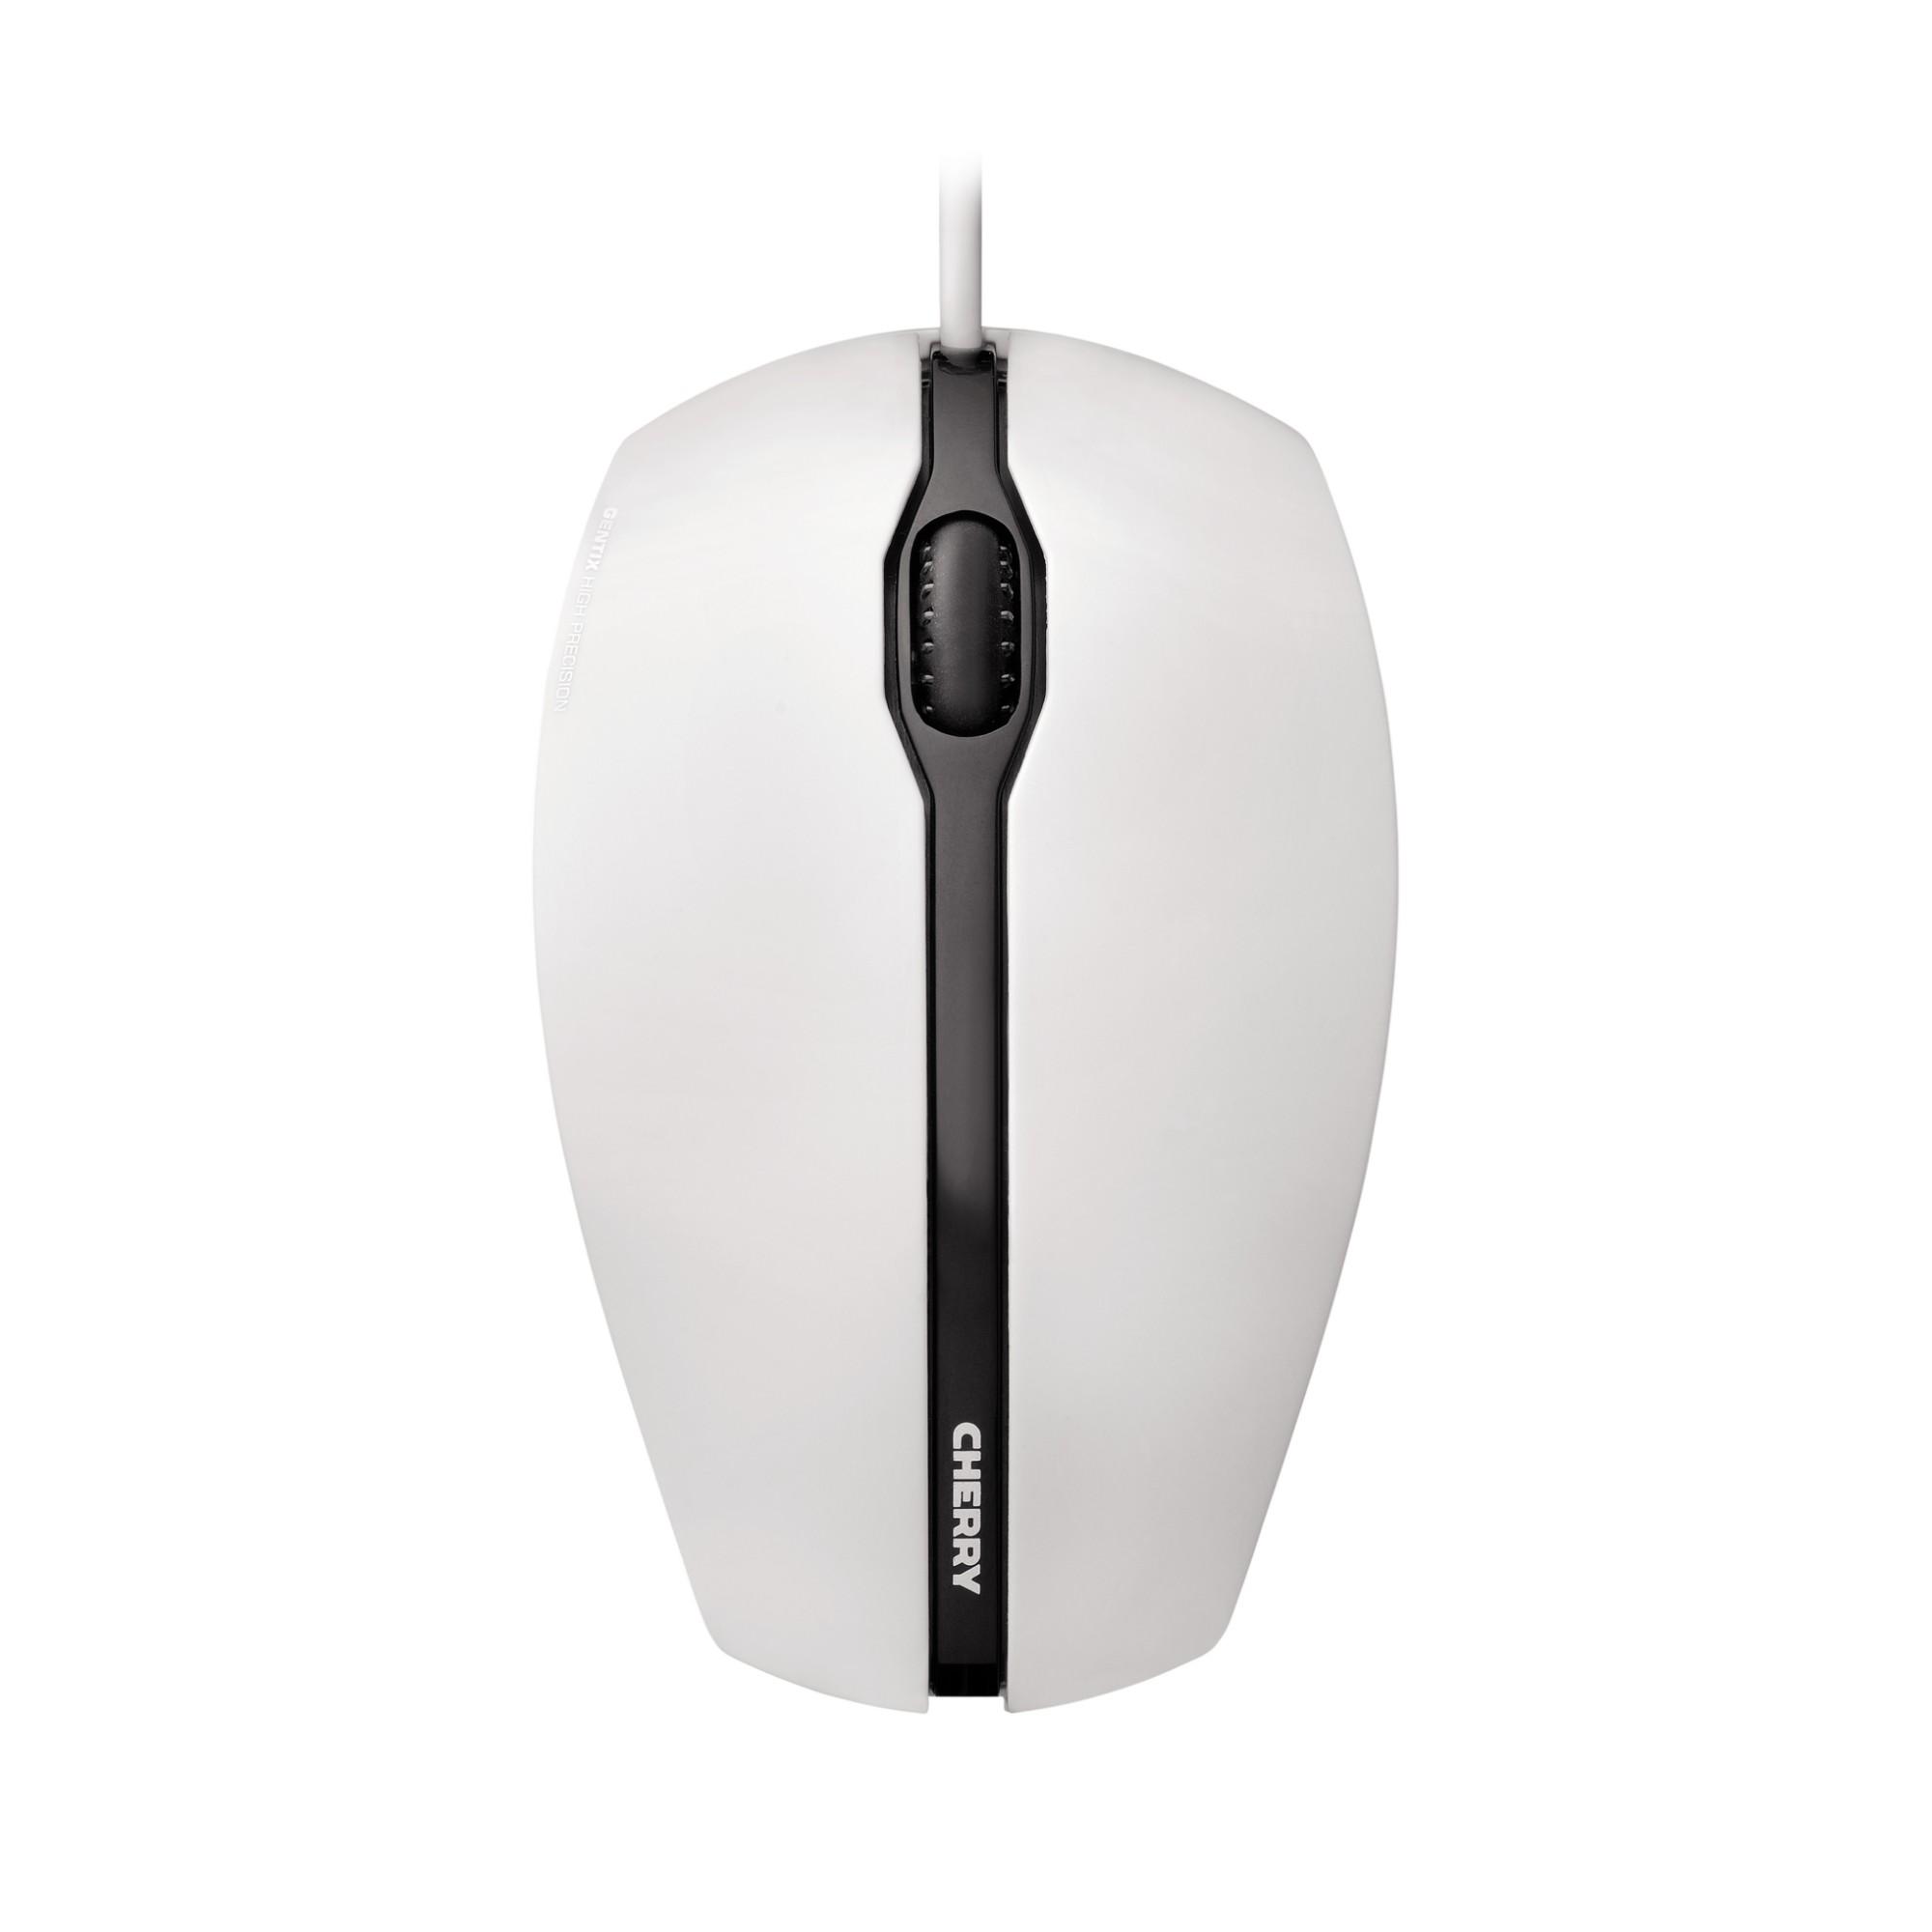 CHERRY GENTIX ratón USB tipo A Óptico 1000 DPI Ambidextro